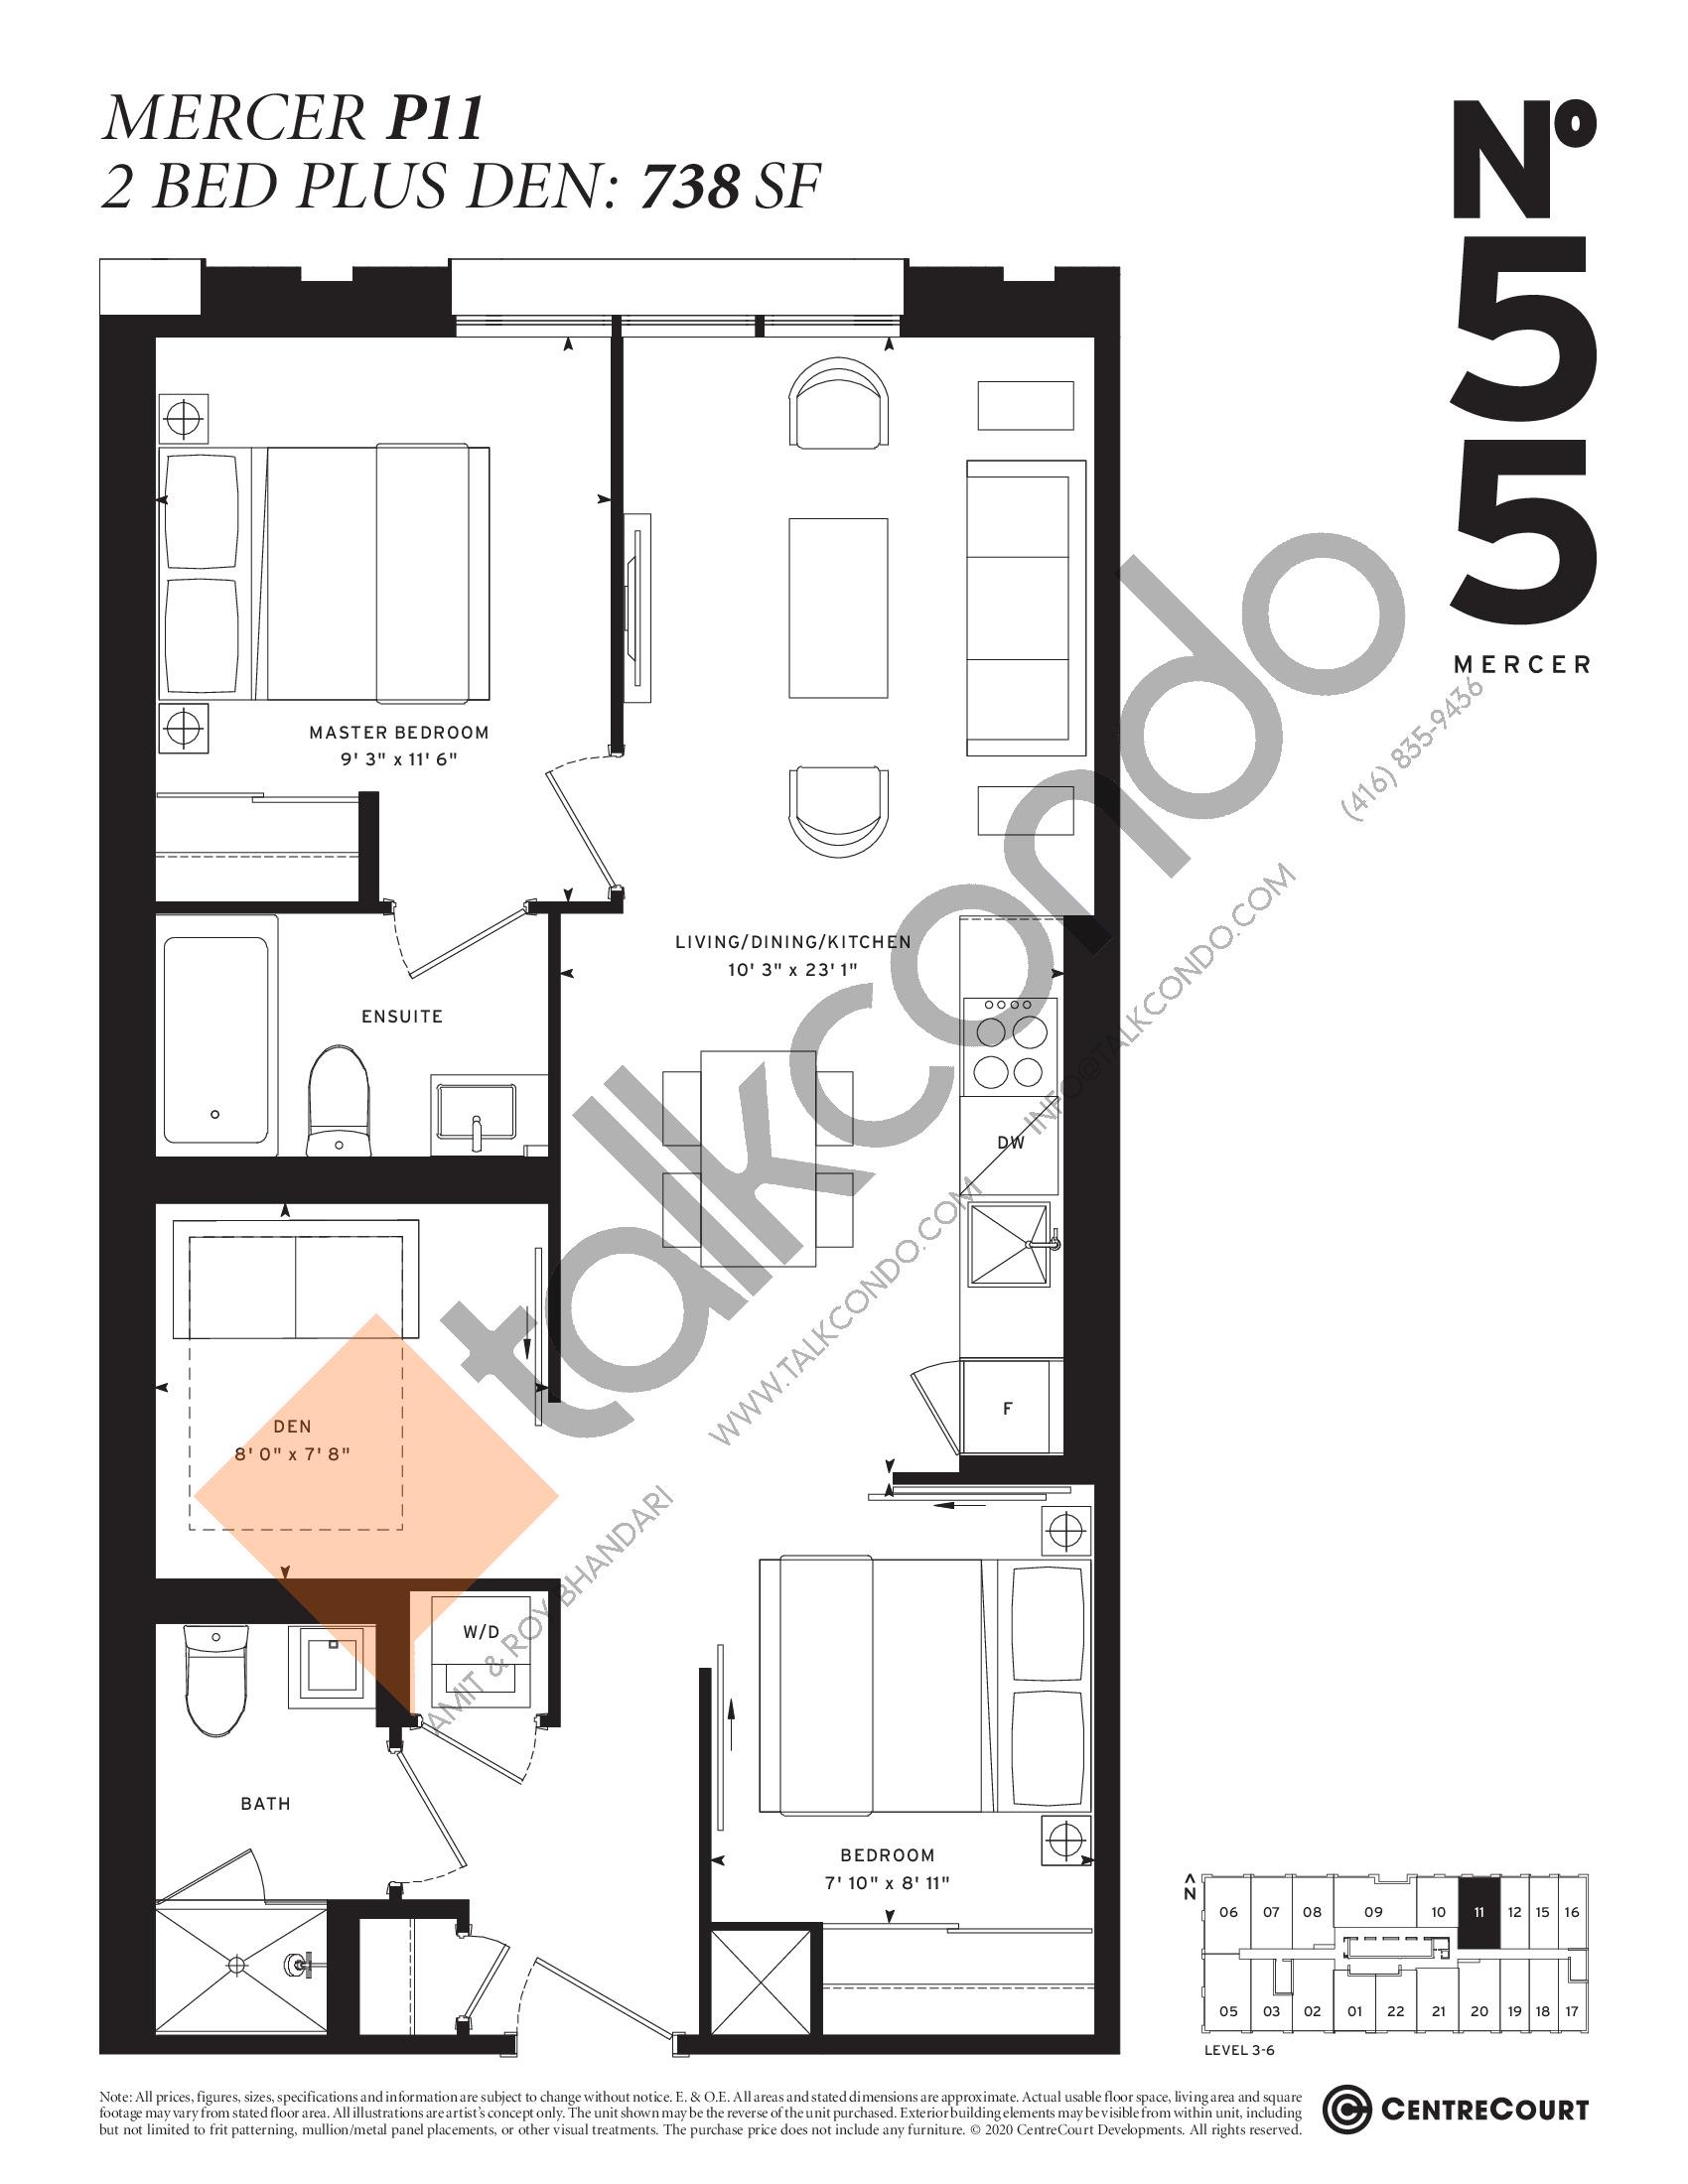 Mercer P11 Floor Plan at No. 55 Mercer Condos - 738 sq.ft